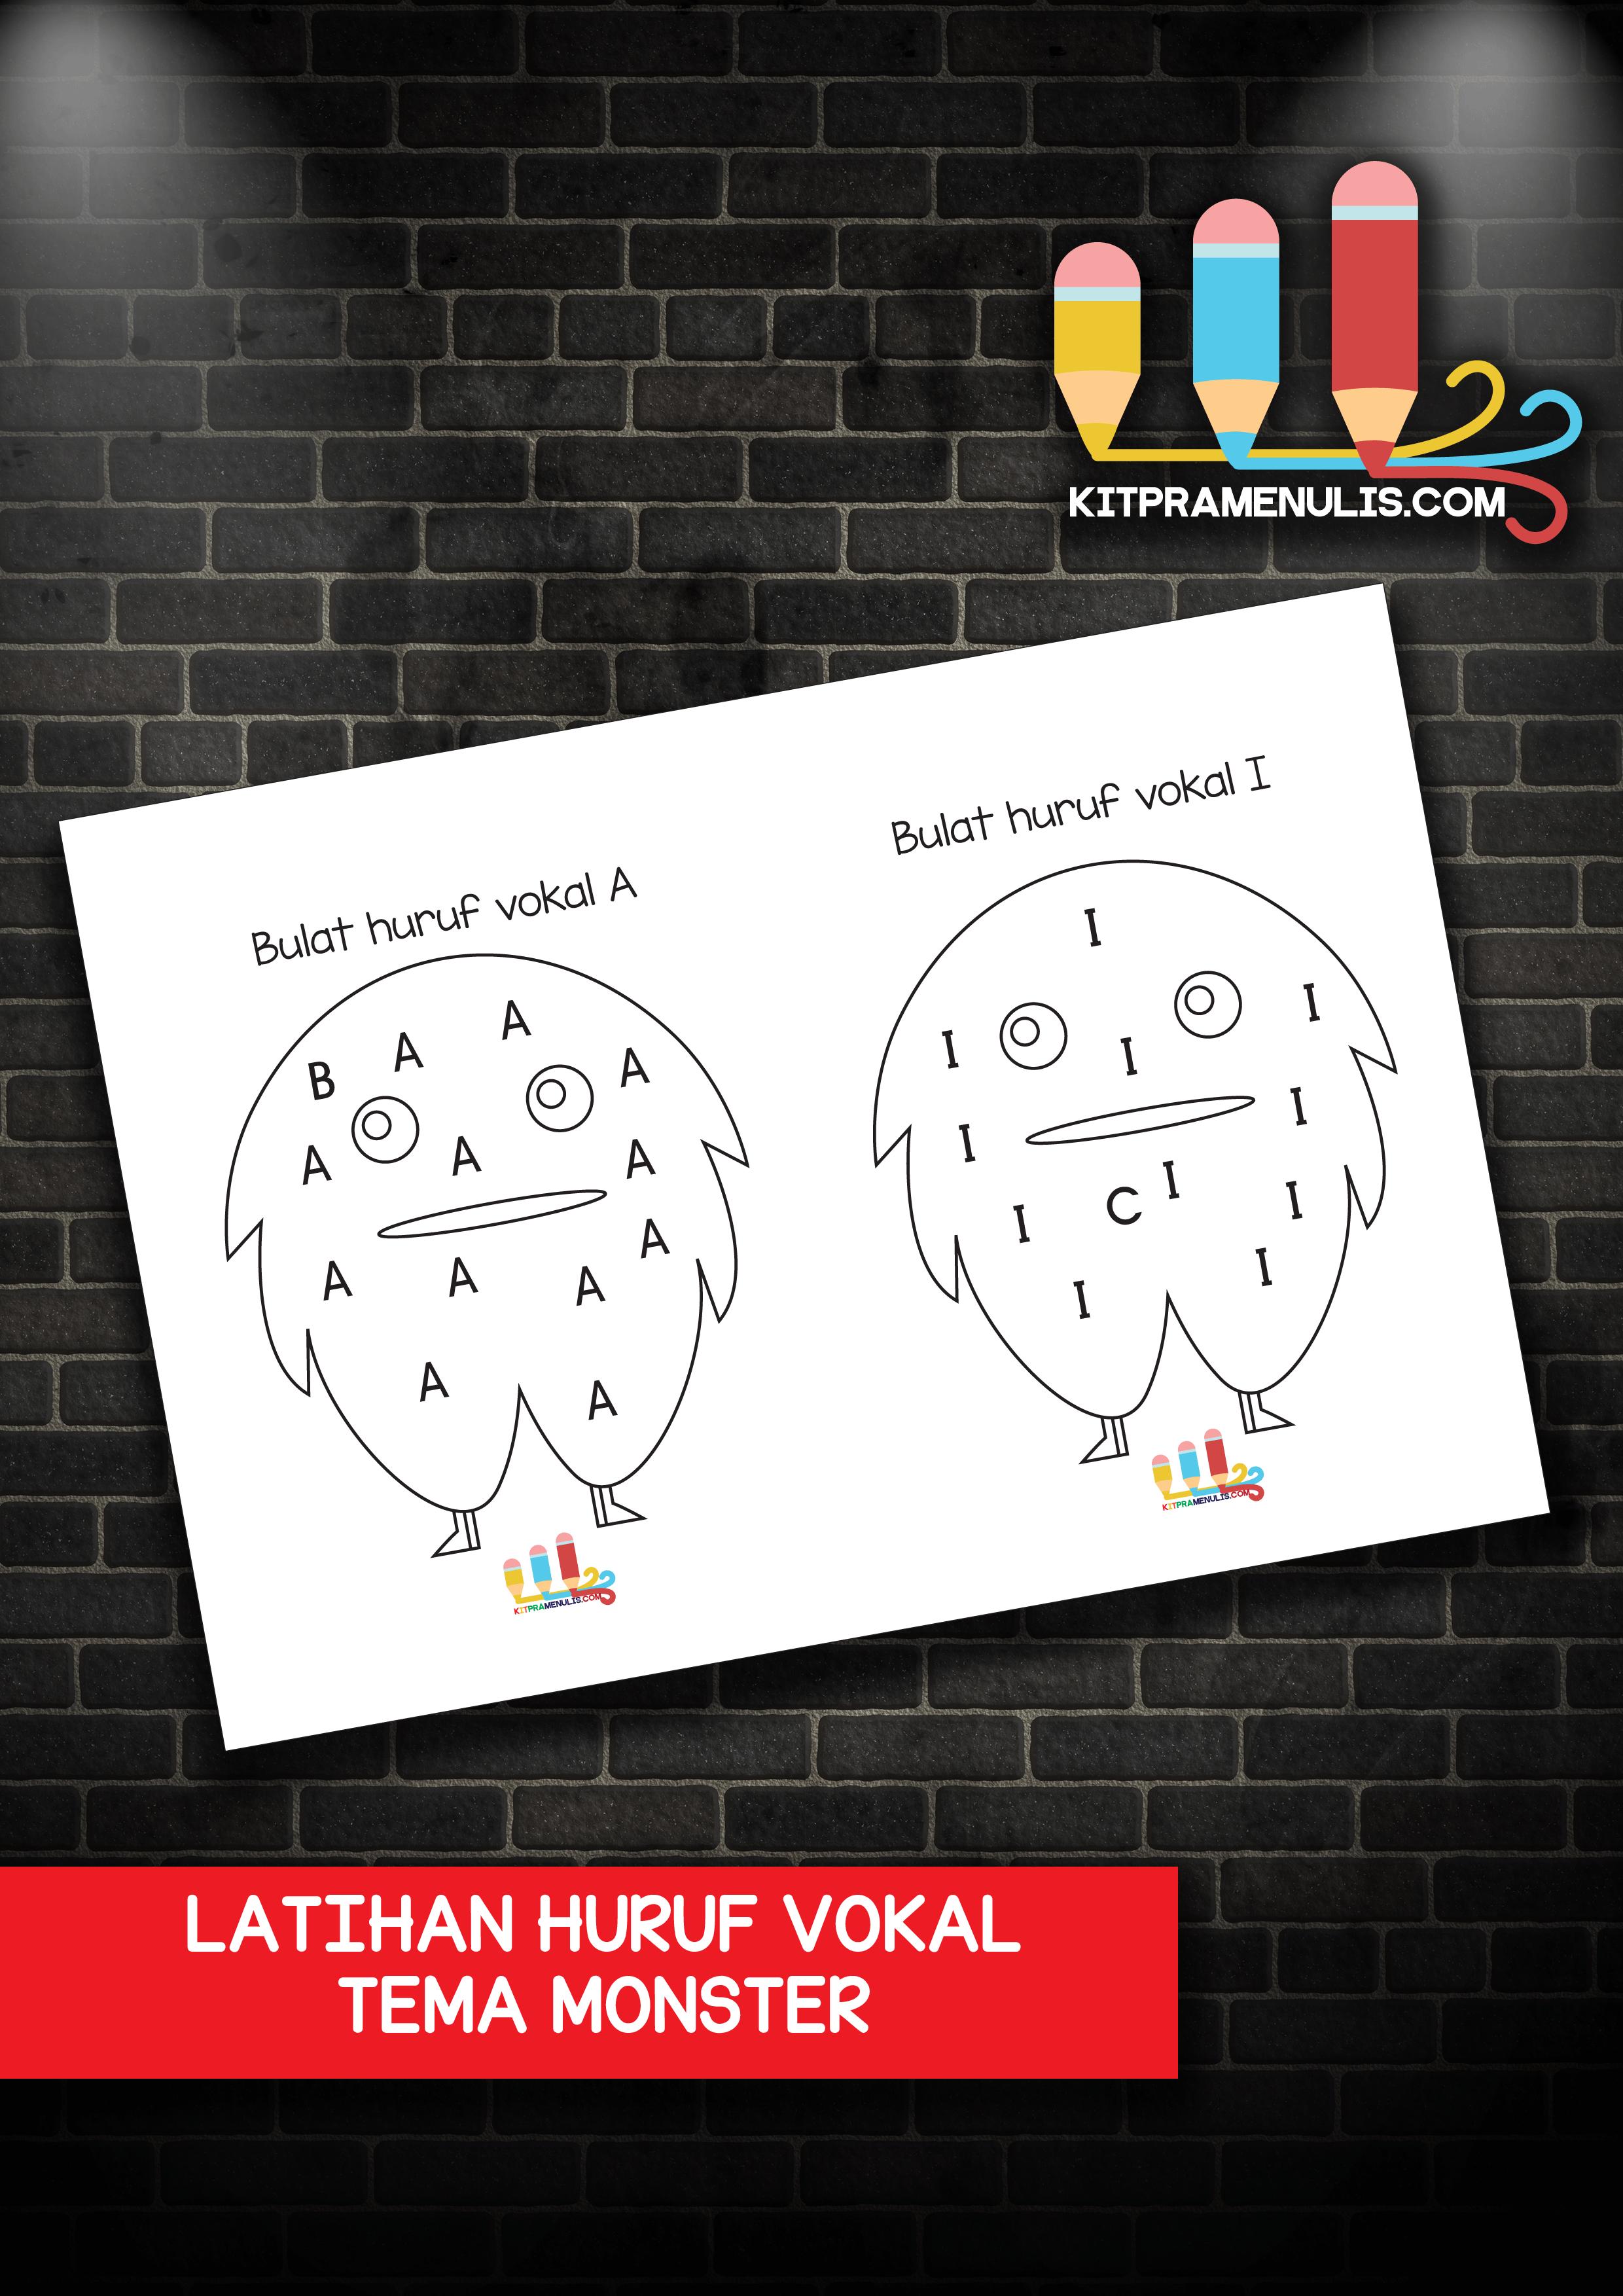 LATIHAN-HURUF-VOKAL-TEMA-MONSTER Latihan Cari Huruf Vokal Tema Monster